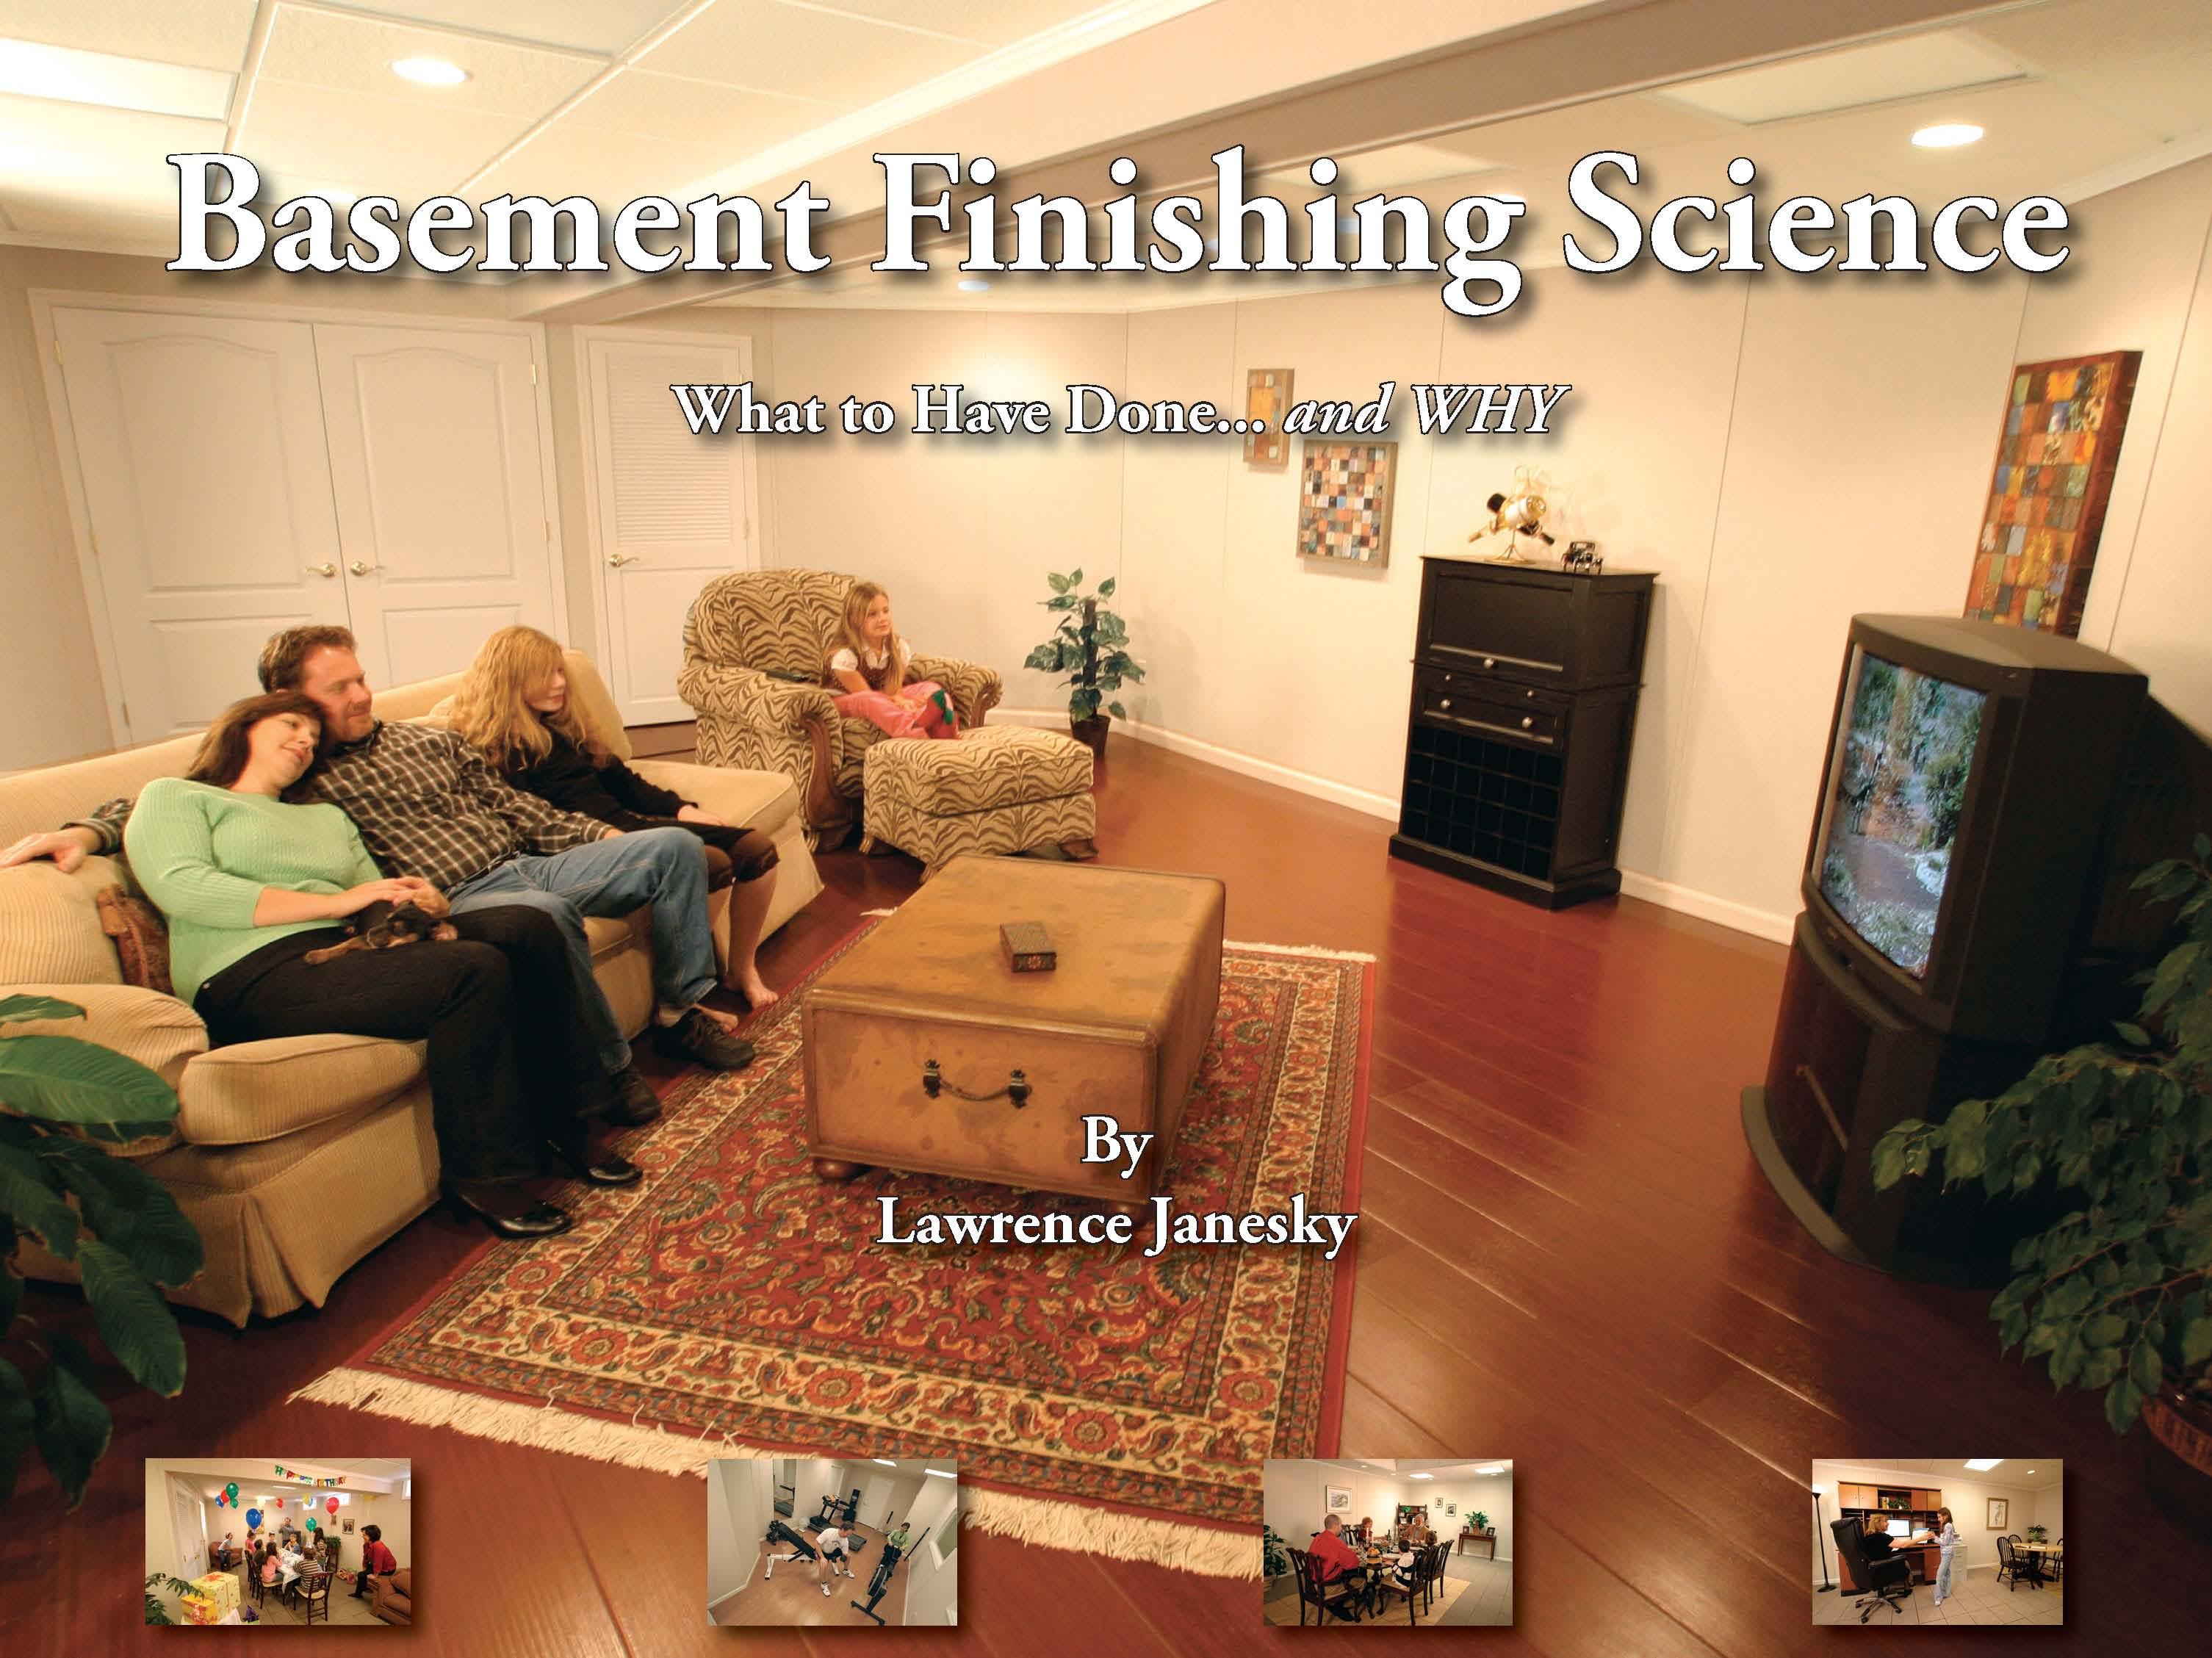 Basement Finishing Science